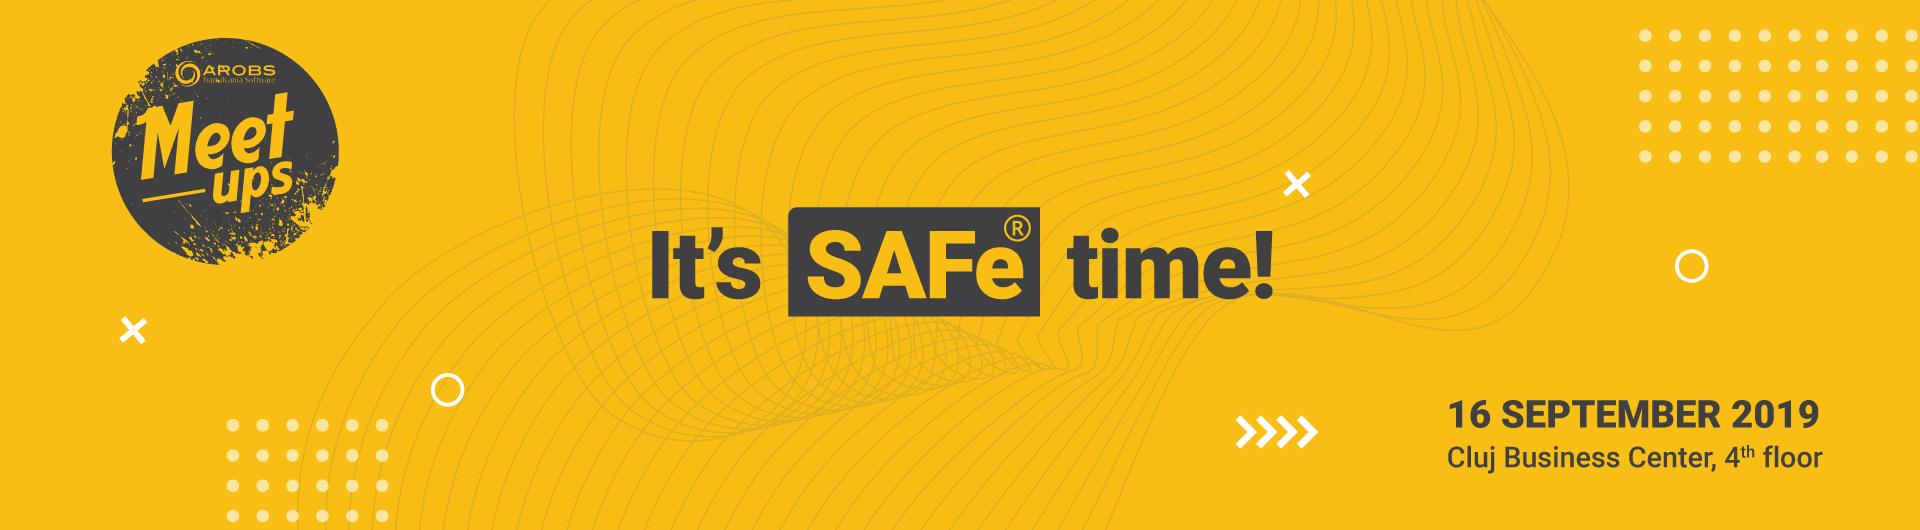 AROBS Meetups: Itʹs SAFe time, with Neru Obhrai, international coach & trainer